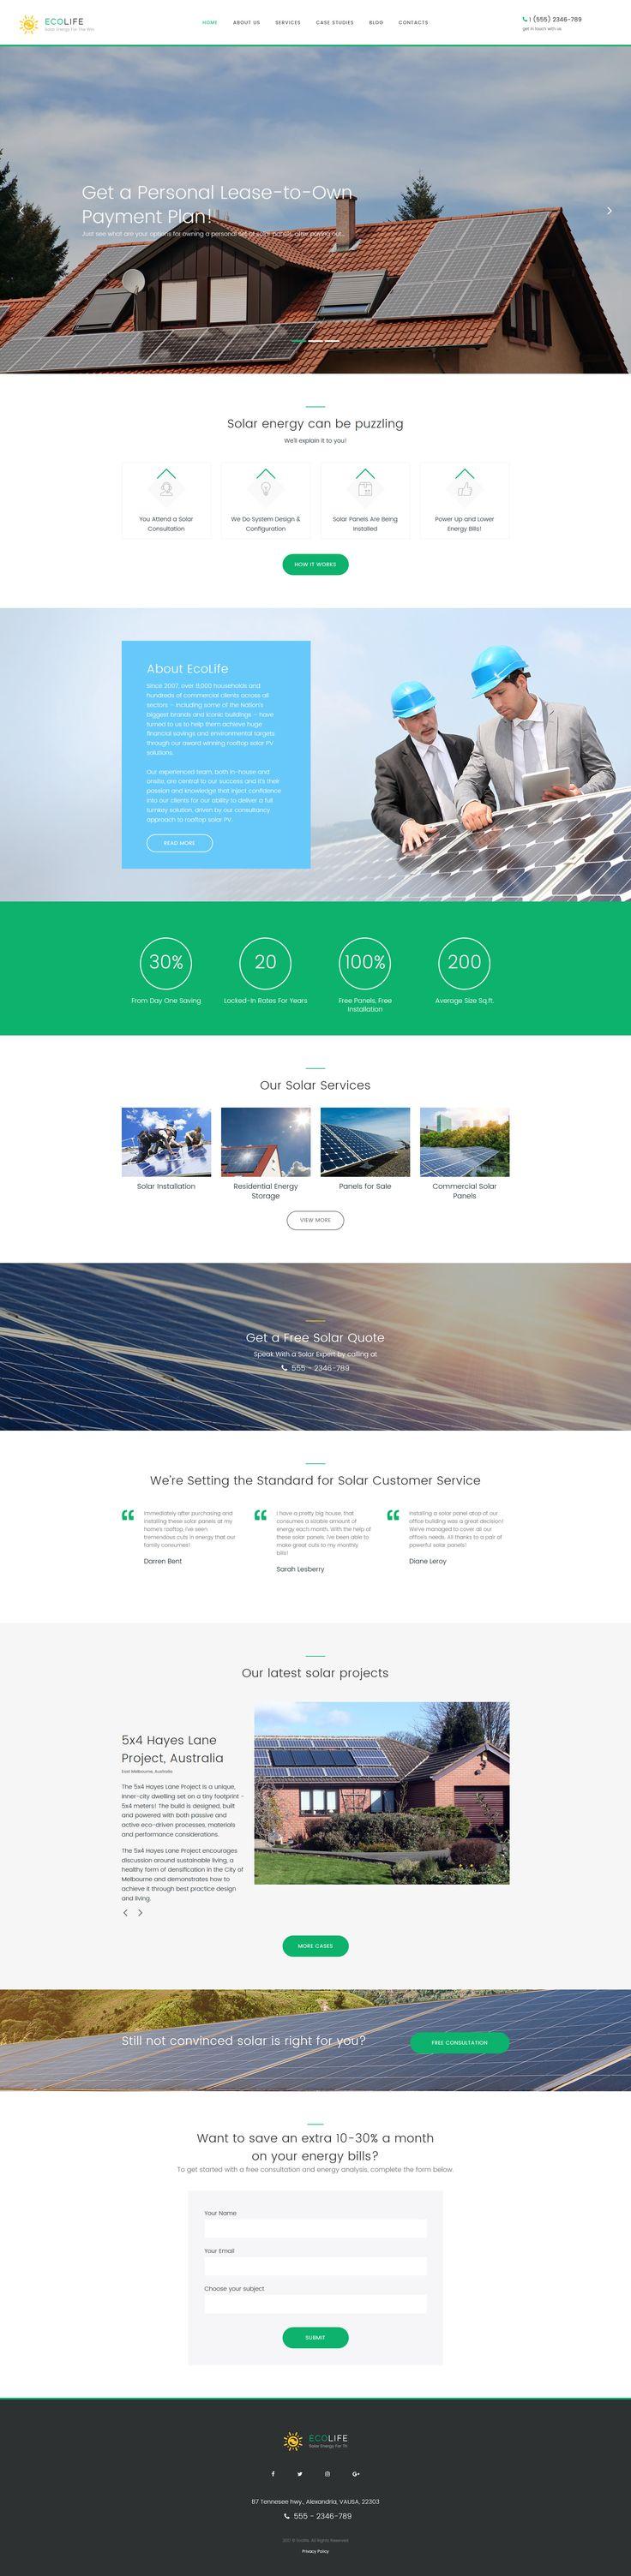 Solar Energy Responsive Moto CMS 3 Template - https://www.templatemonster.com/moto-cms-3-templates/solar-energy-responsive-moto-cms-3-template-59420.html